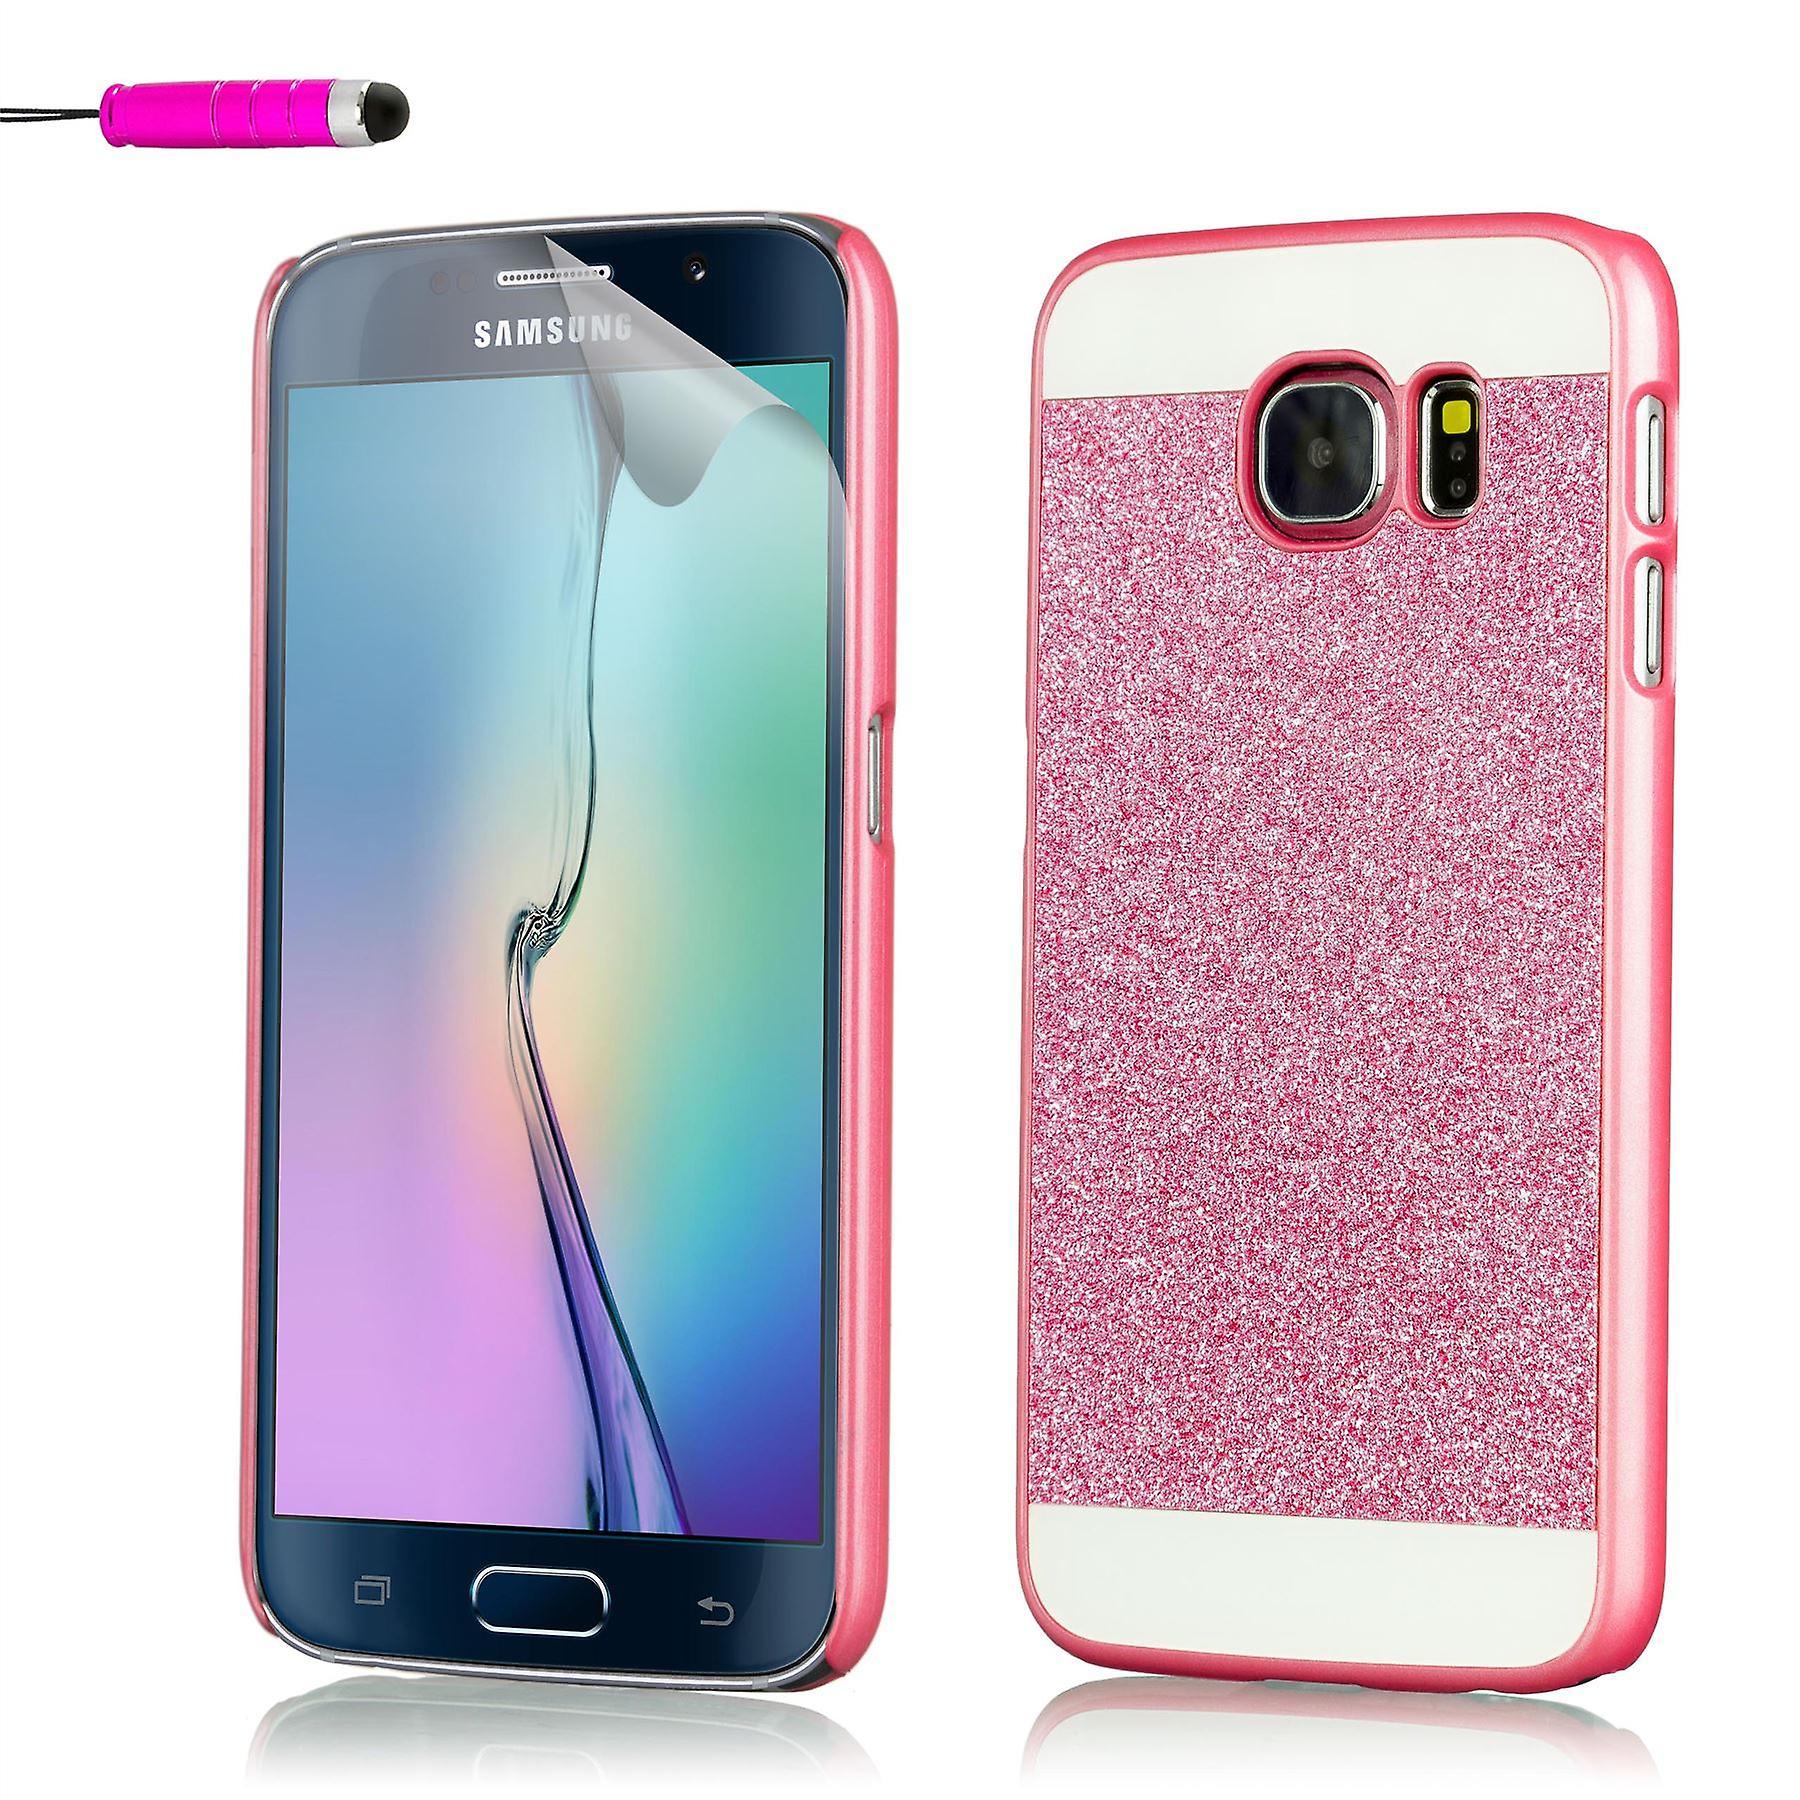 Glitter case + stylus for Samsung Galaxy S7 Edge SM-G935 - Hot Pink